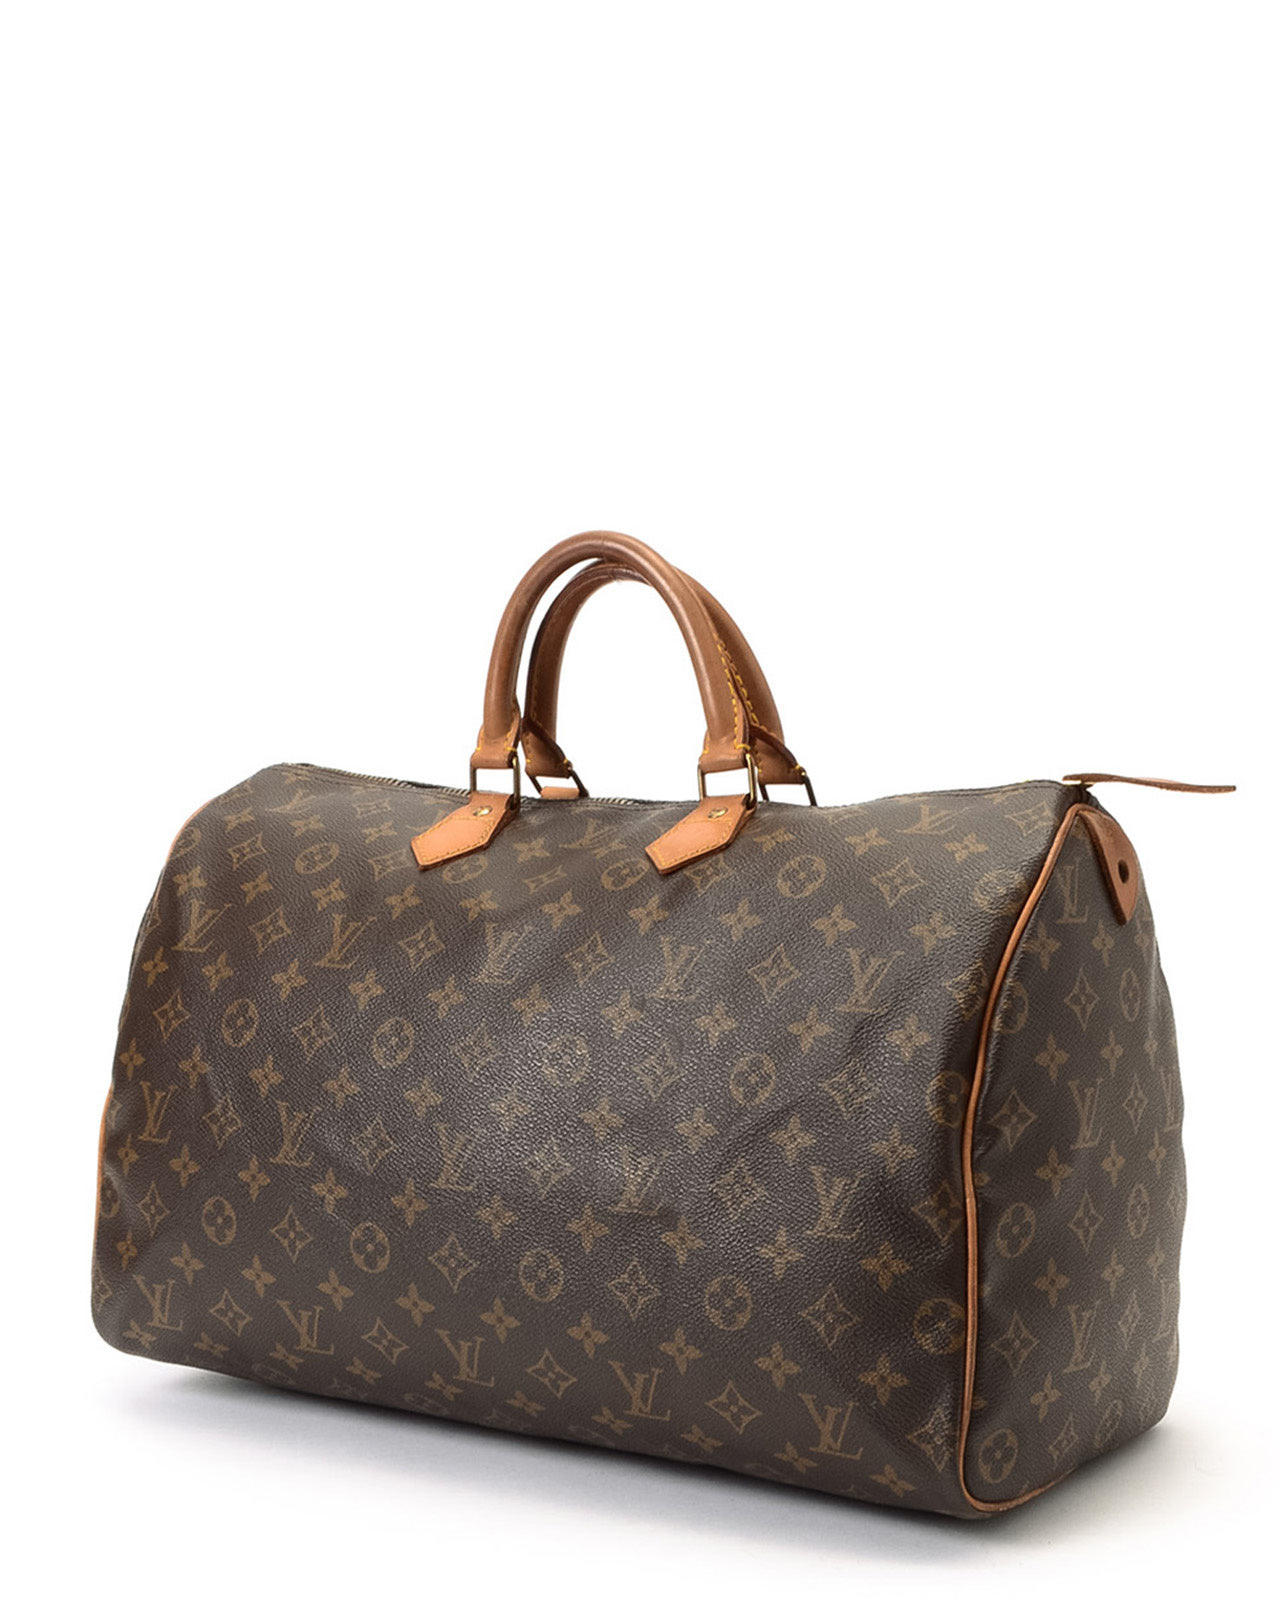 louis vuitton monogram speedy 40 handbag in brown lyst. Black Bedroom Furniture Sets. Home Design Ideas